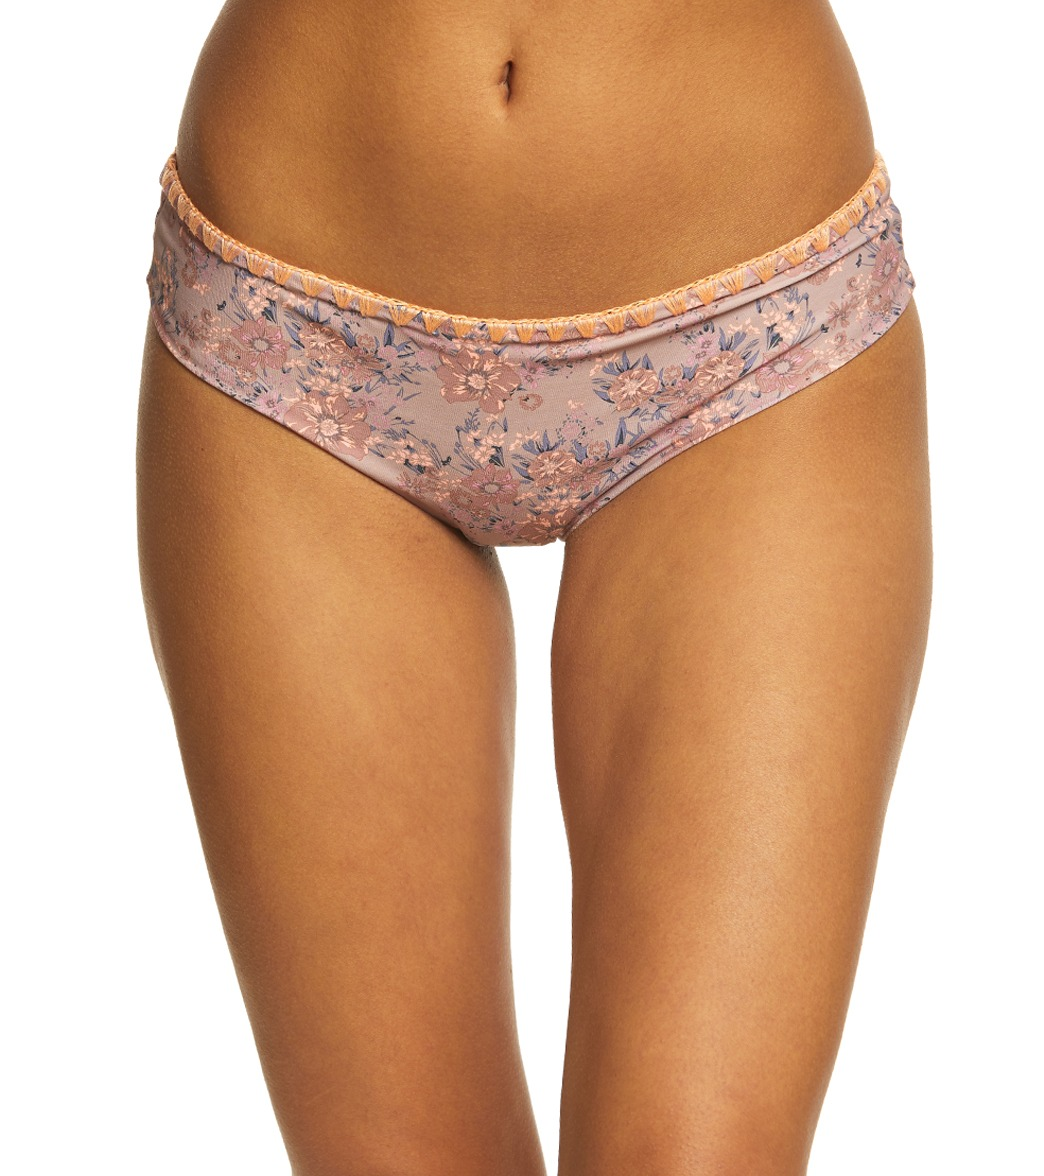 c24bfe910a O'Neill Calvin Floral Hipster Bikini Bottom at SwimOutlet.com